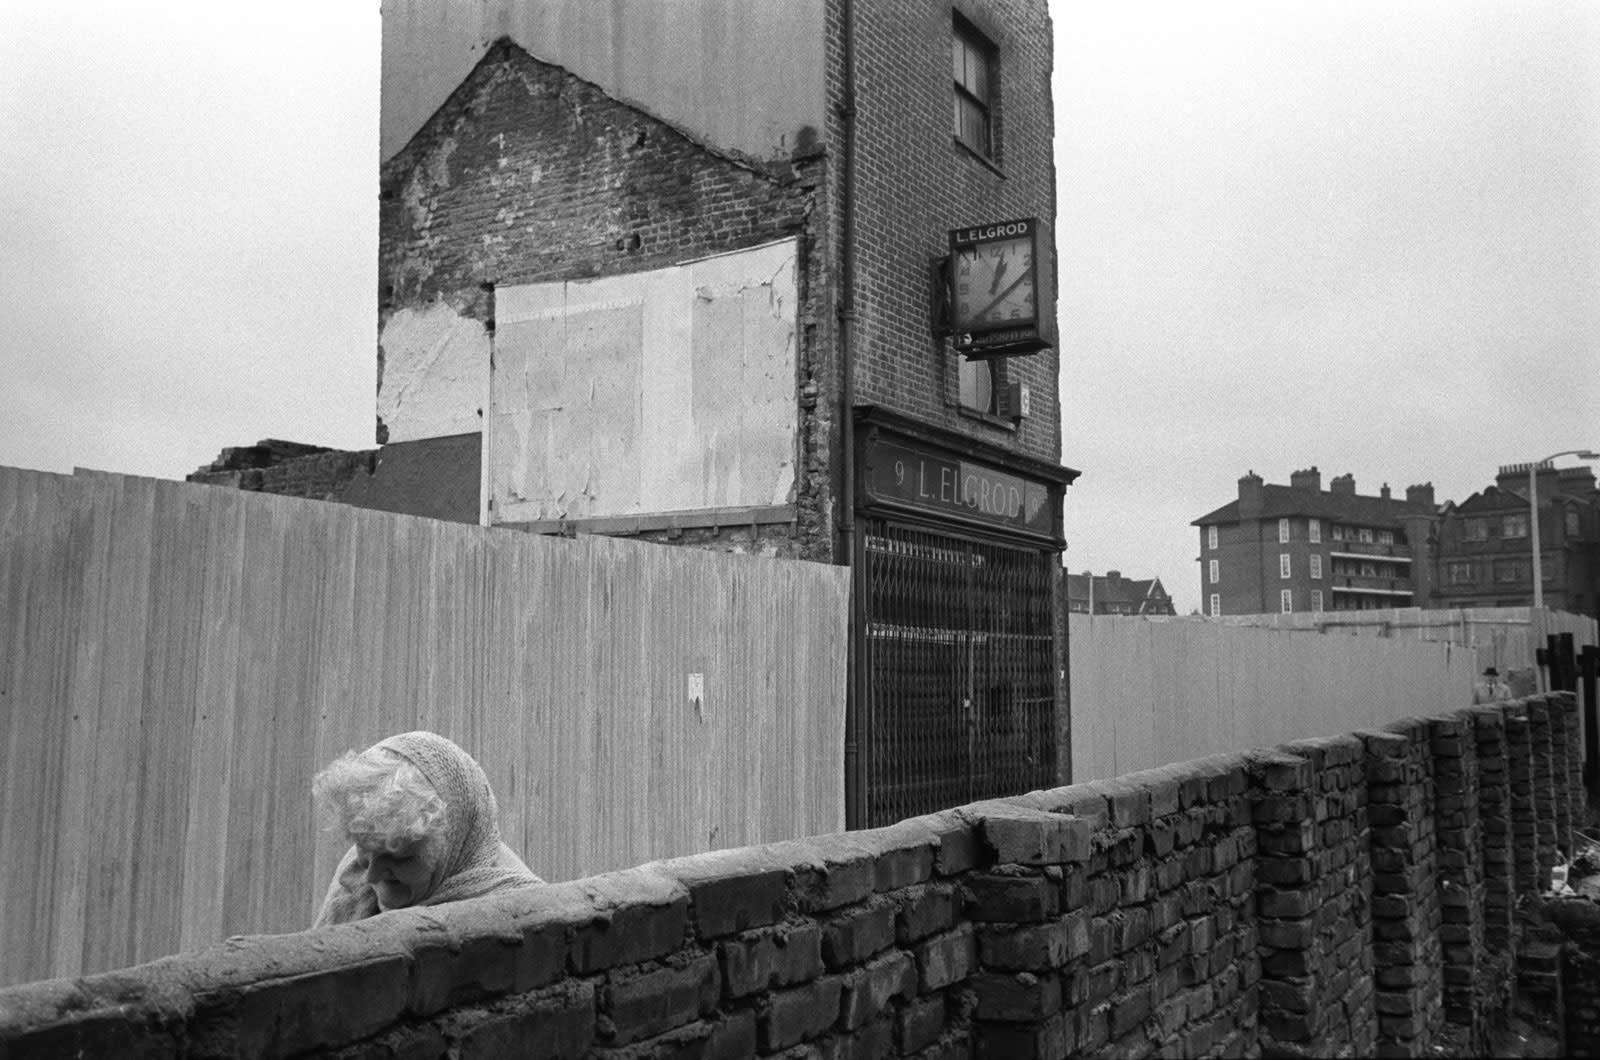 Homer Sykes, Poverty, Tower Hamlets Spitalfields, East London, 1975